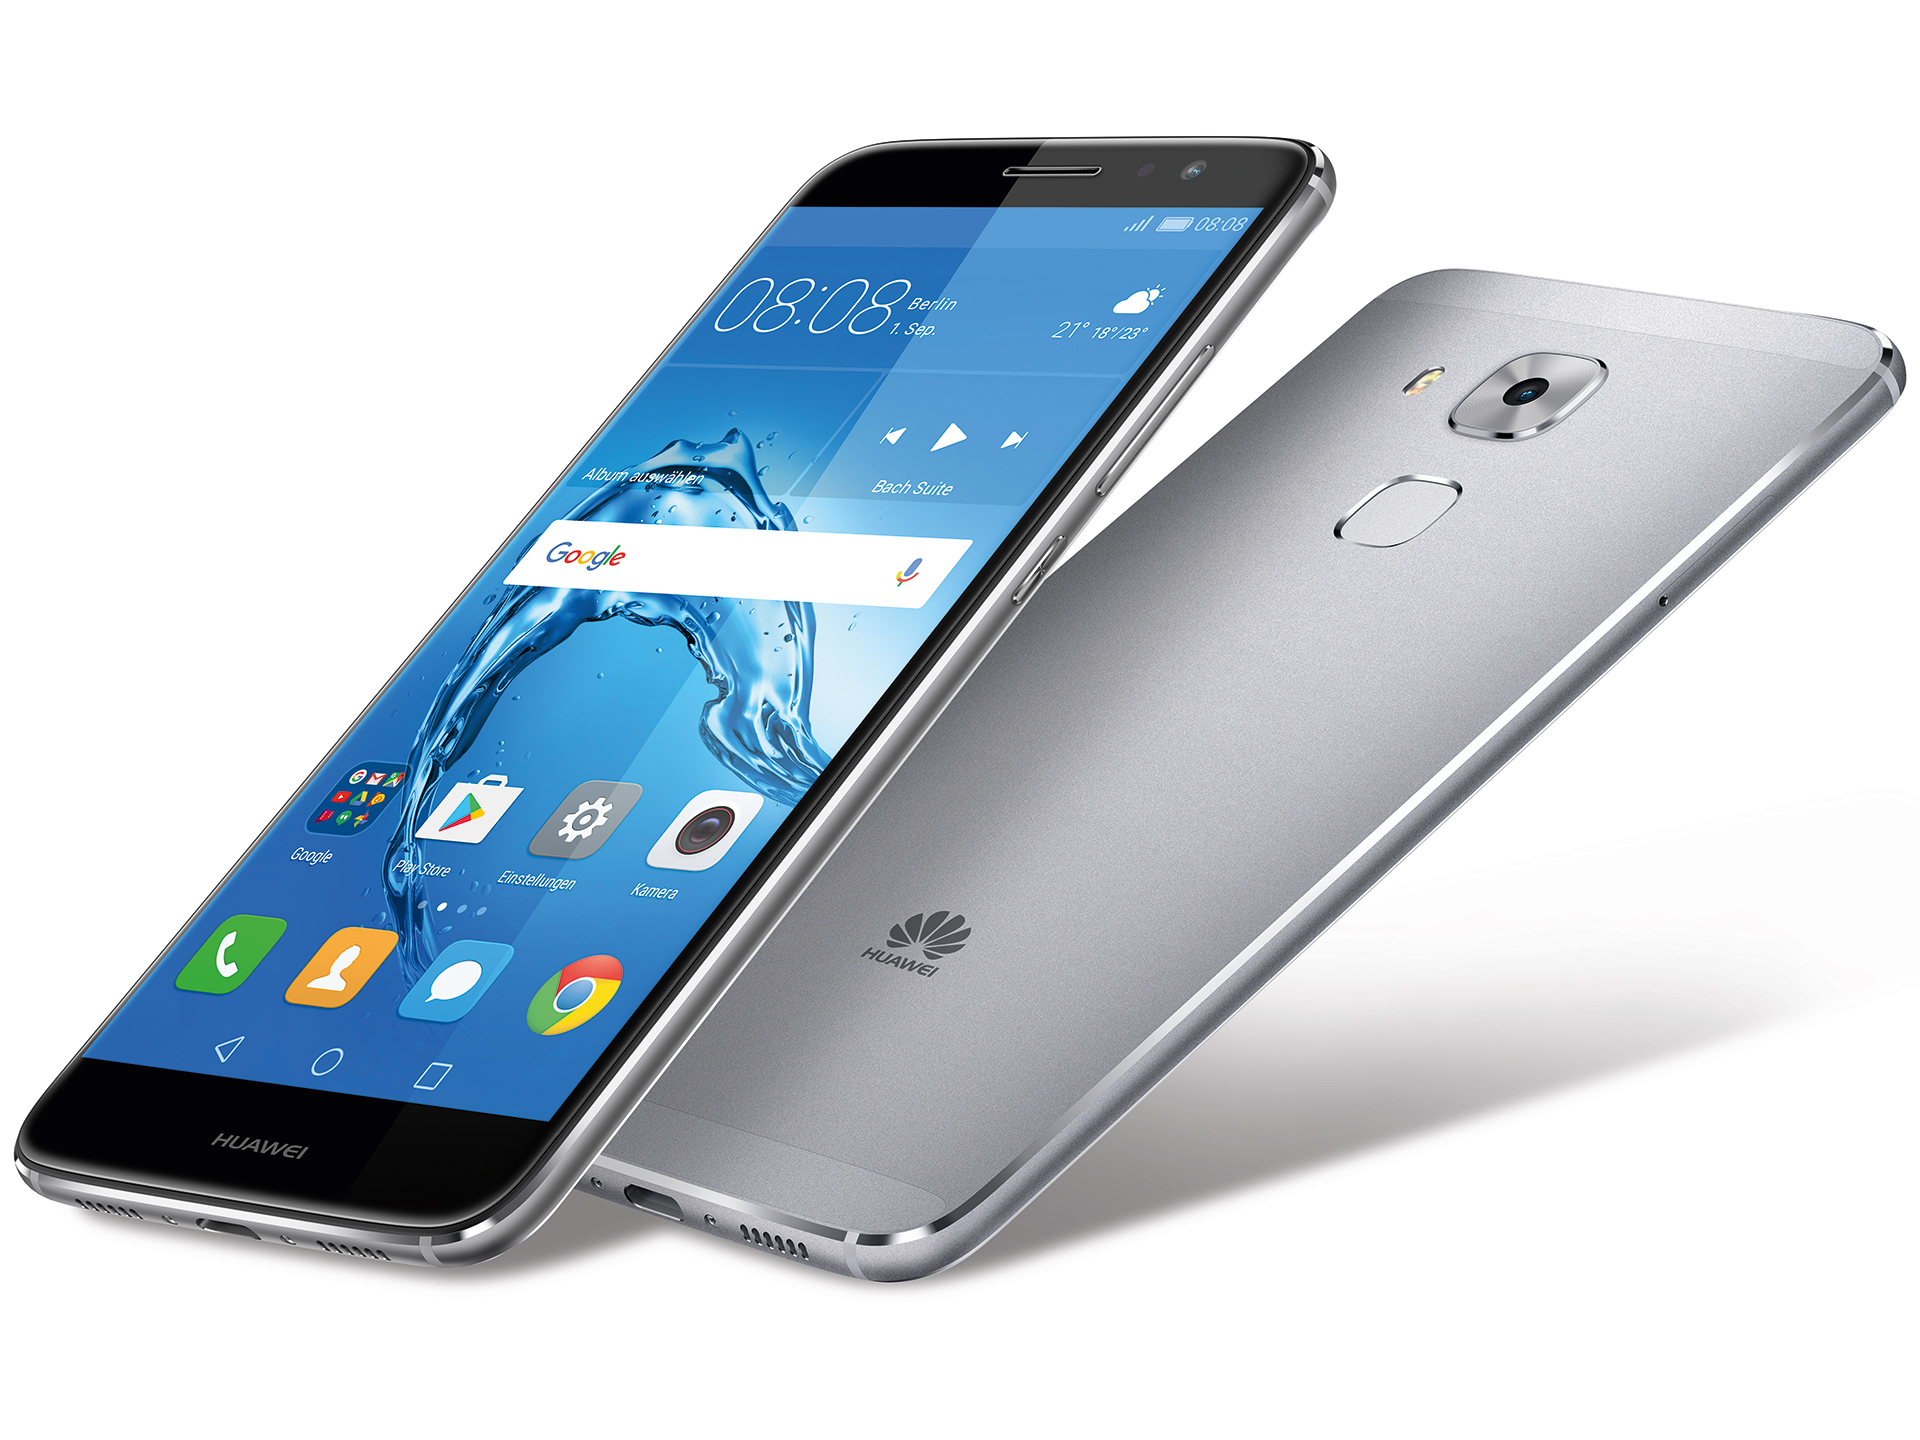 Huawei Nova Plus Smartphone Review